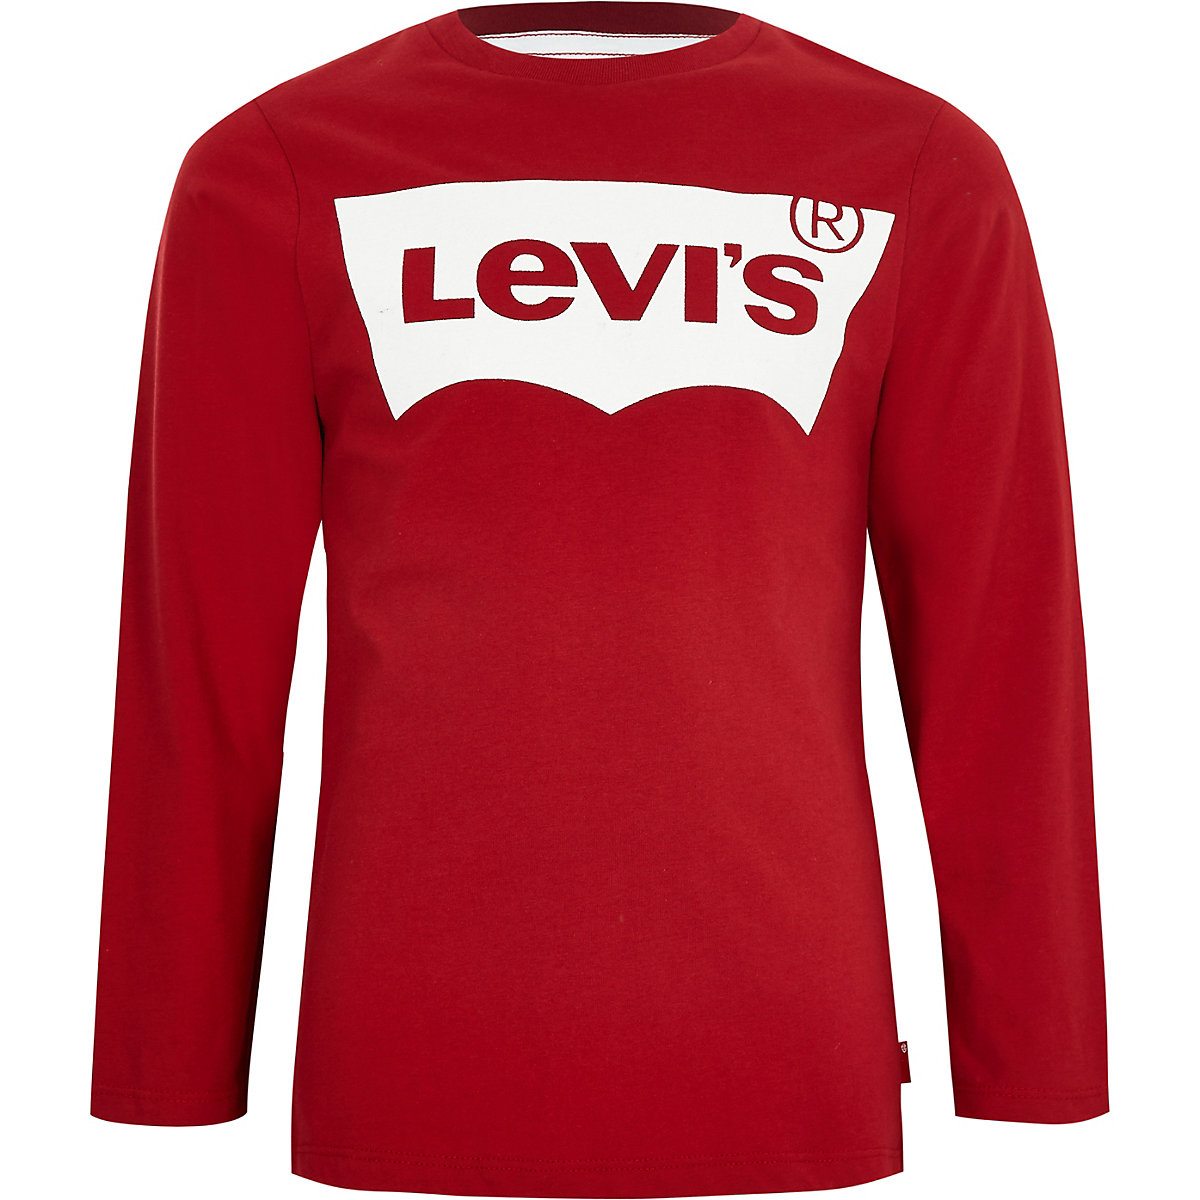 Boys Levi's red long sleeve T-shirt